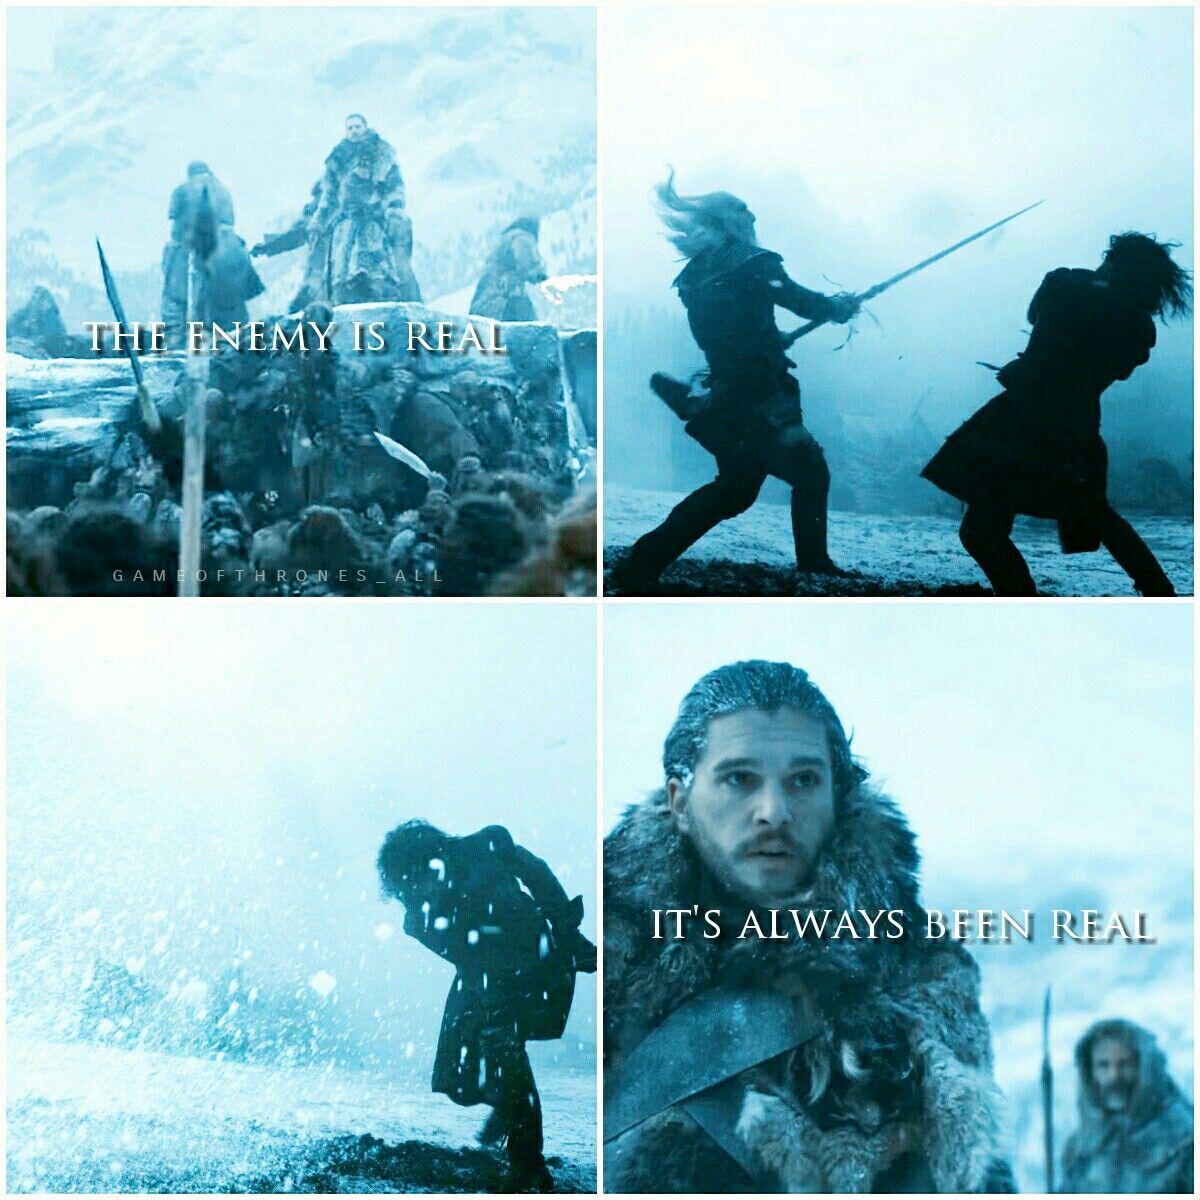 Game Of Thrones Season 7 And Season 5 Parallel Jon Snow White Walkers Valerian Steel Longclow Ice Oathke Hbo Game Of Thrones Game Of Thrones 3 Kings Game